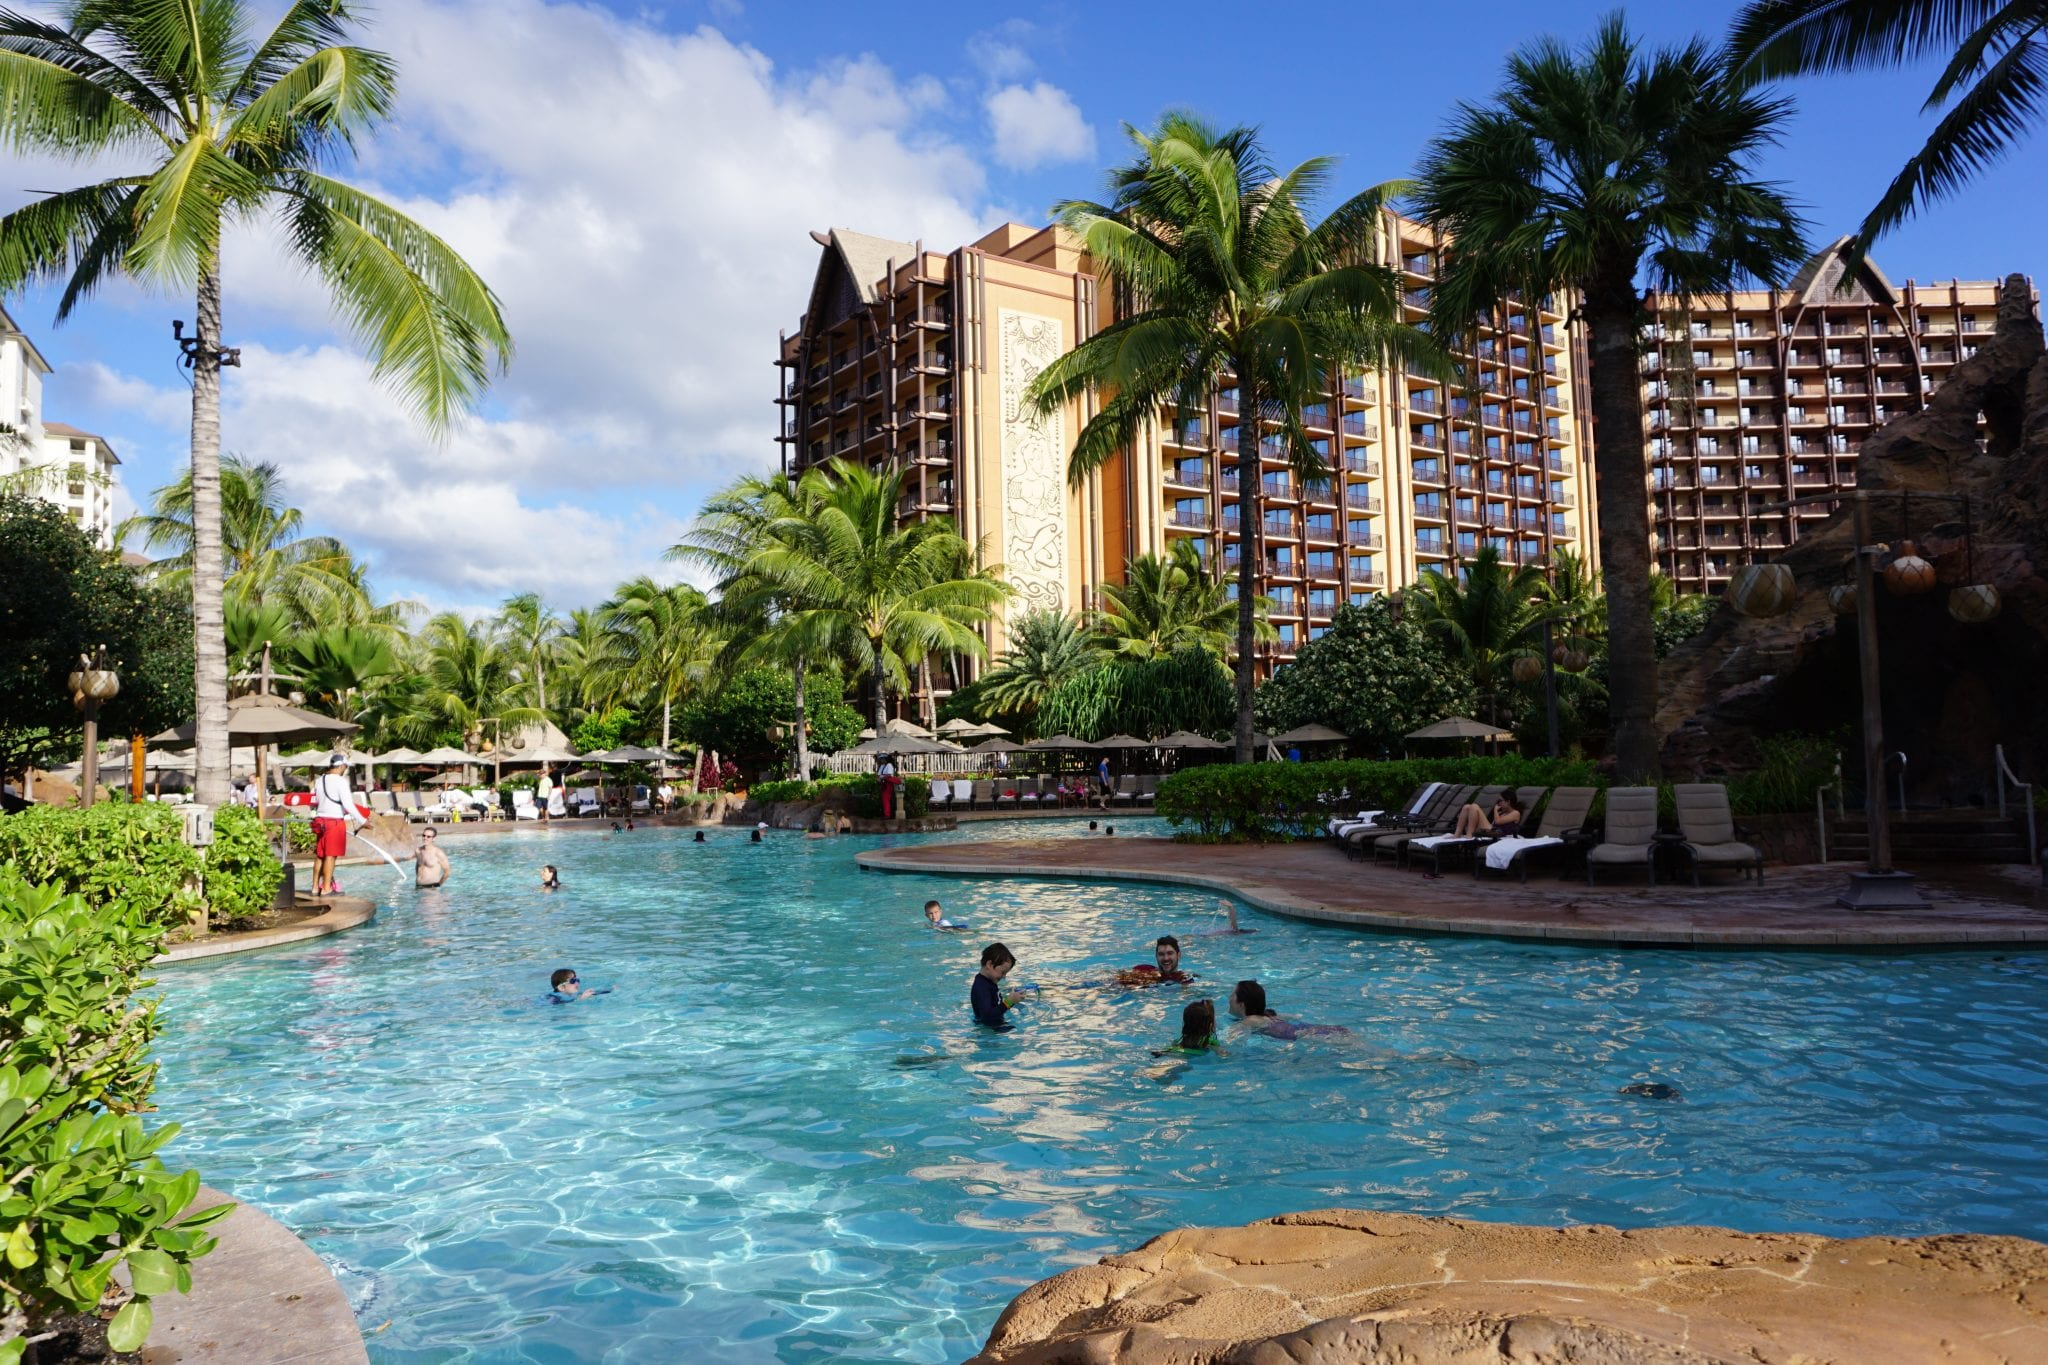 Kia Palm Springs >> How we SAVE 50% on Disney Resorts with DVC Points - Disney ...